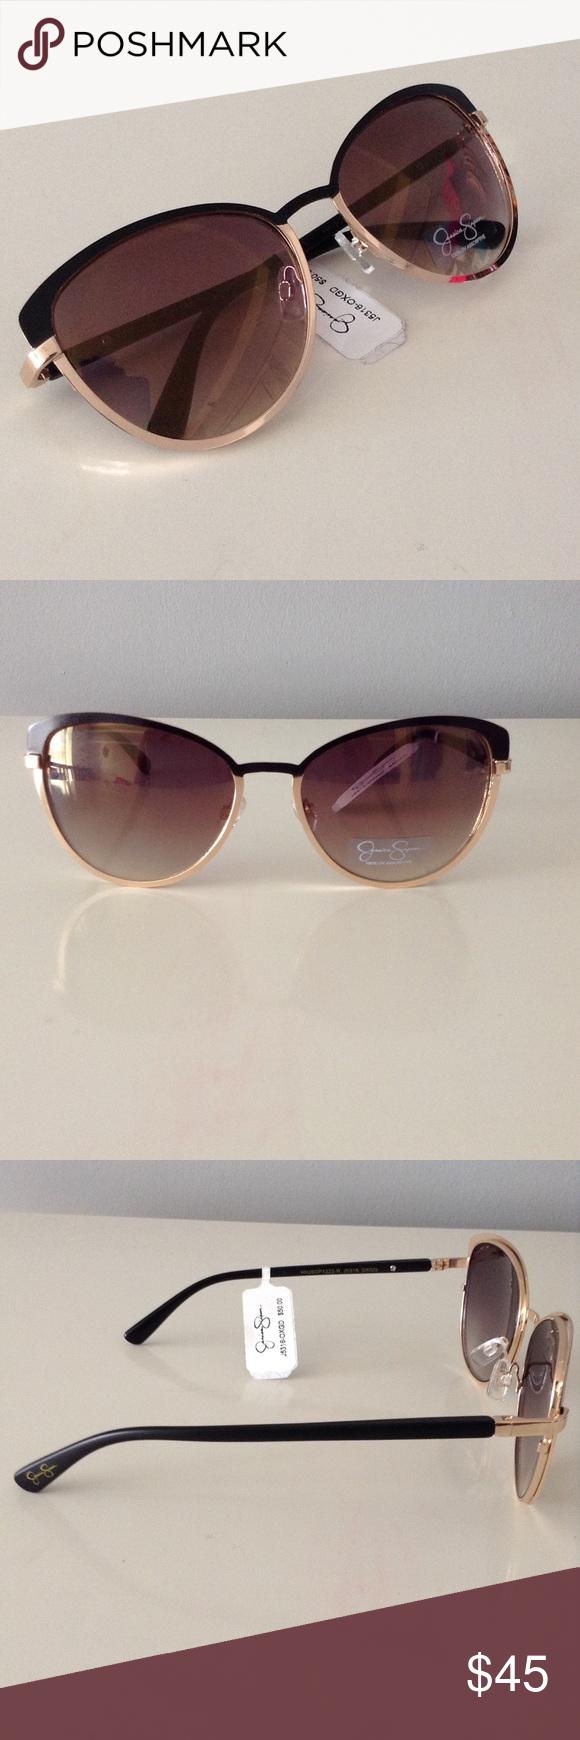 7b9ef5a626 Chic Round Black   Gold Sunglasses New Jessica Simpson Accessories  Sunglasses